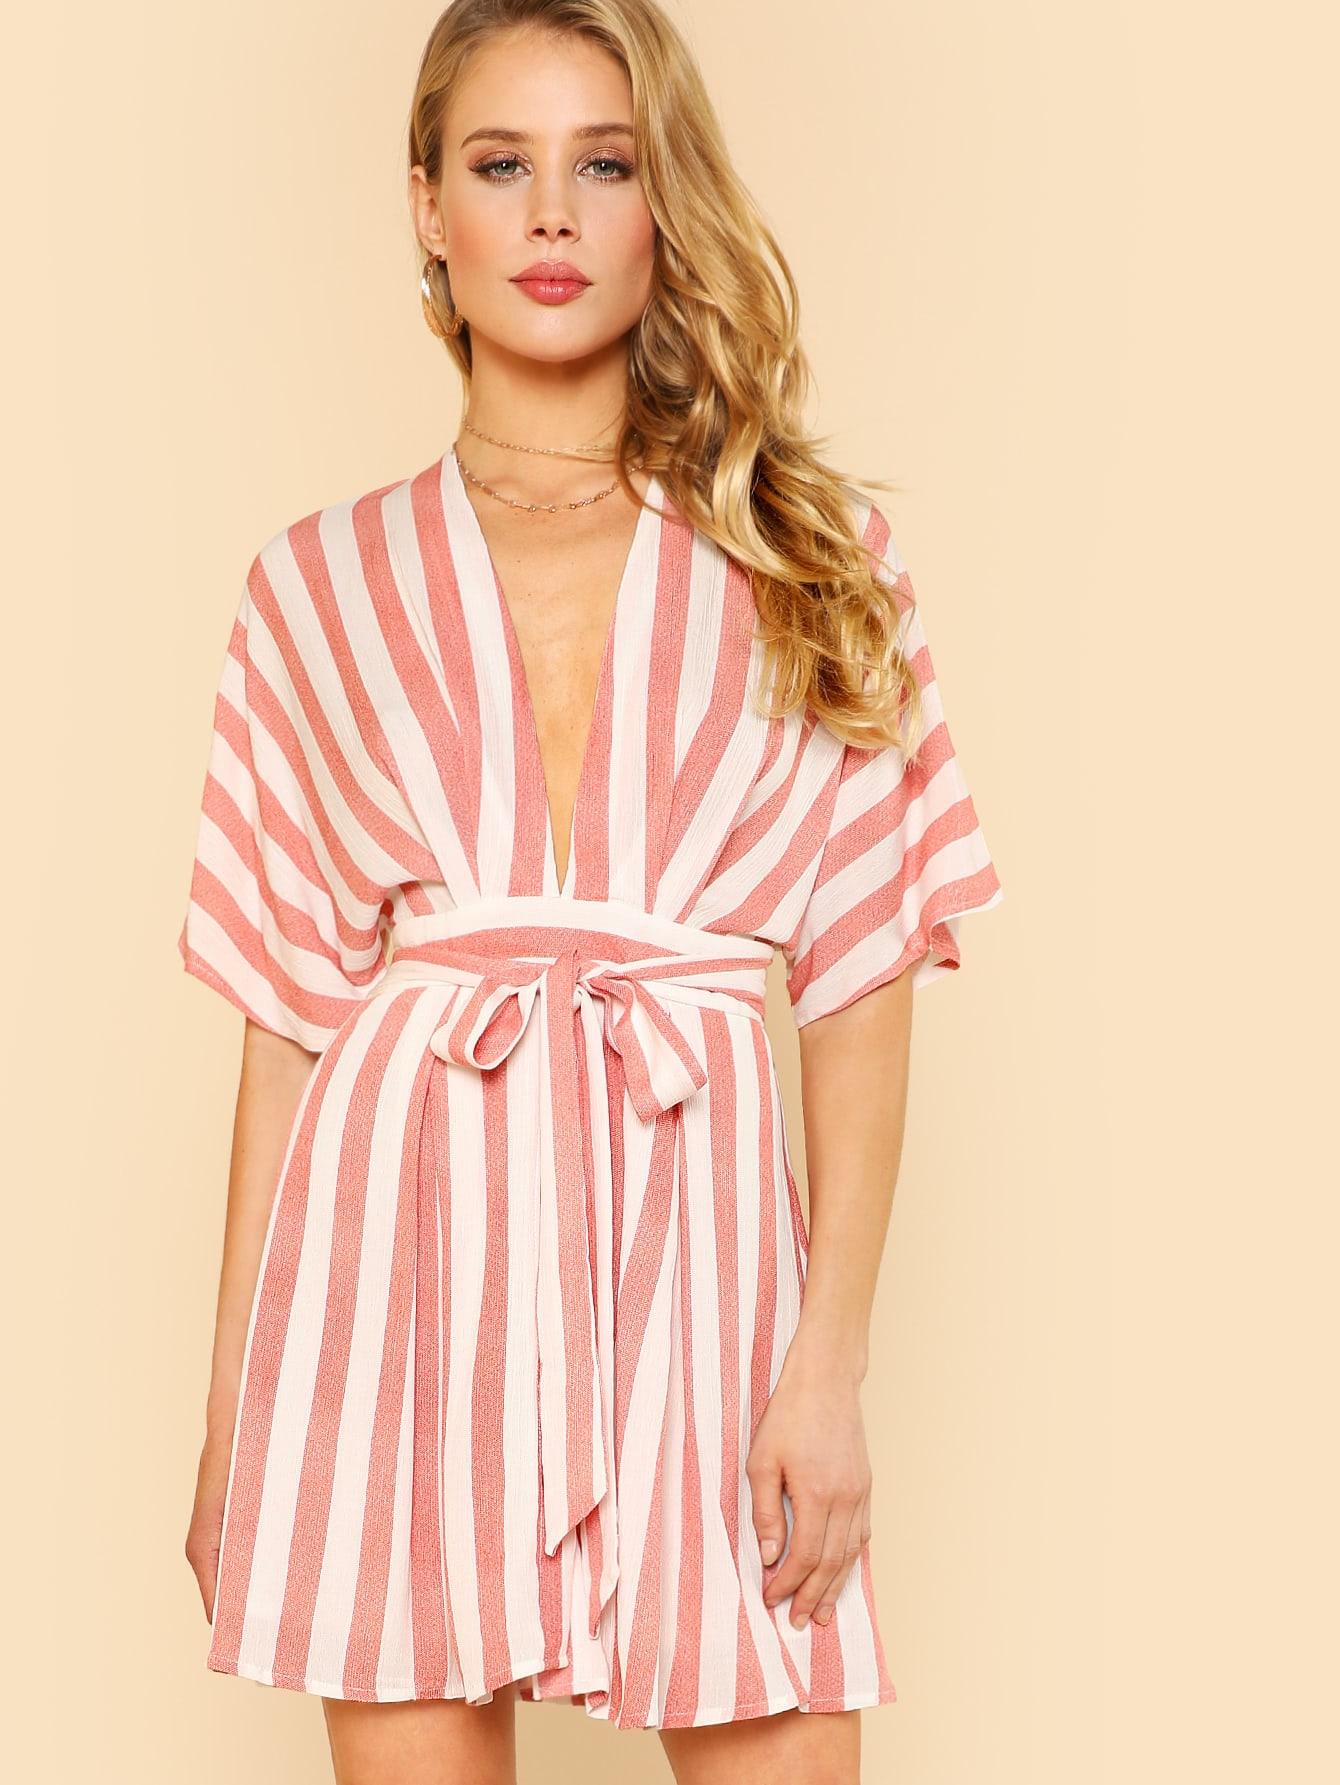 Open Back Belted Striped Dress open back fit